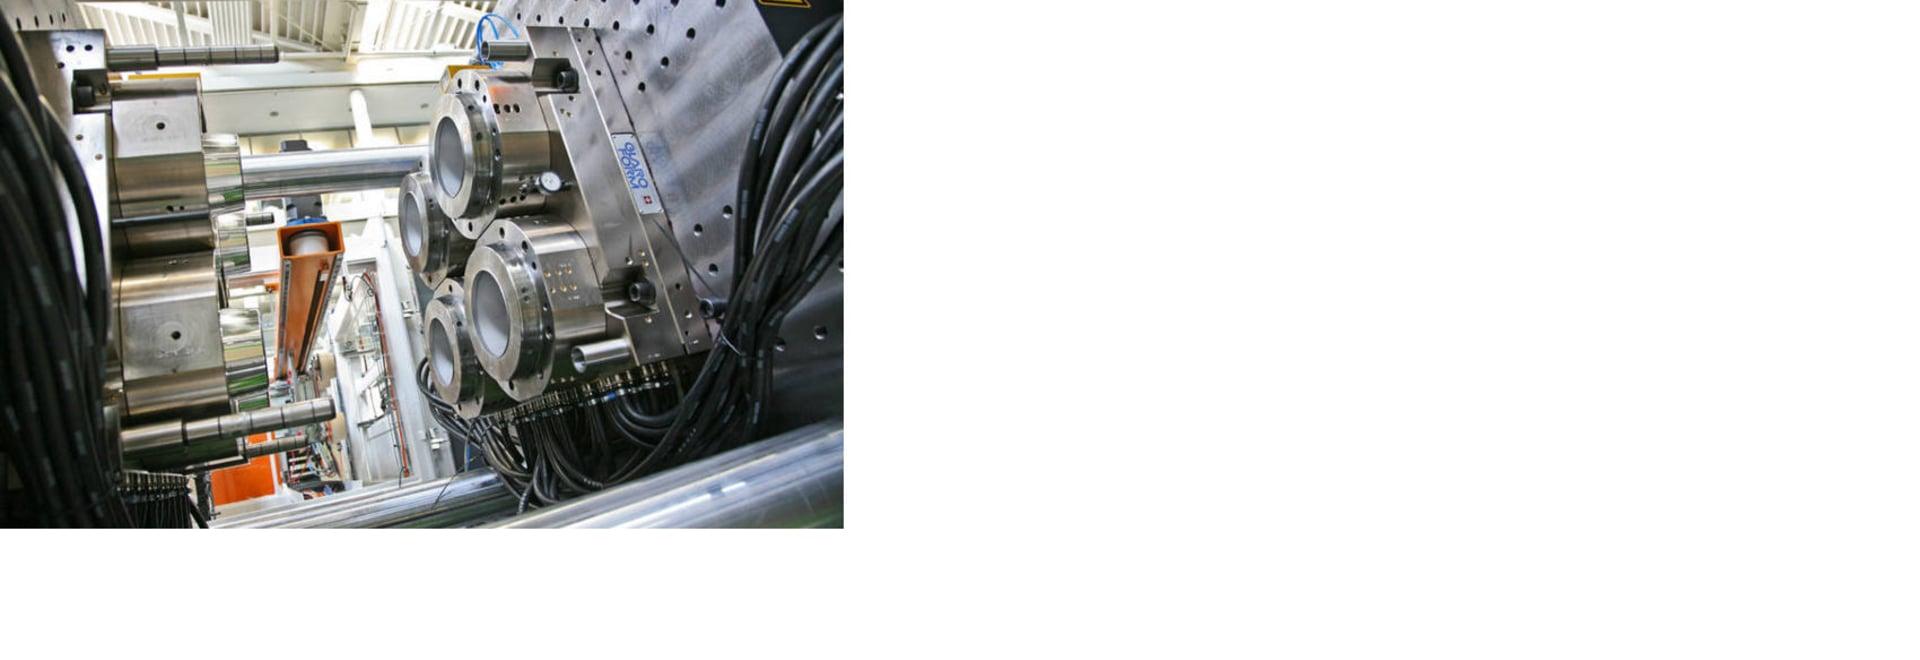 ENGEL iQ clamp control